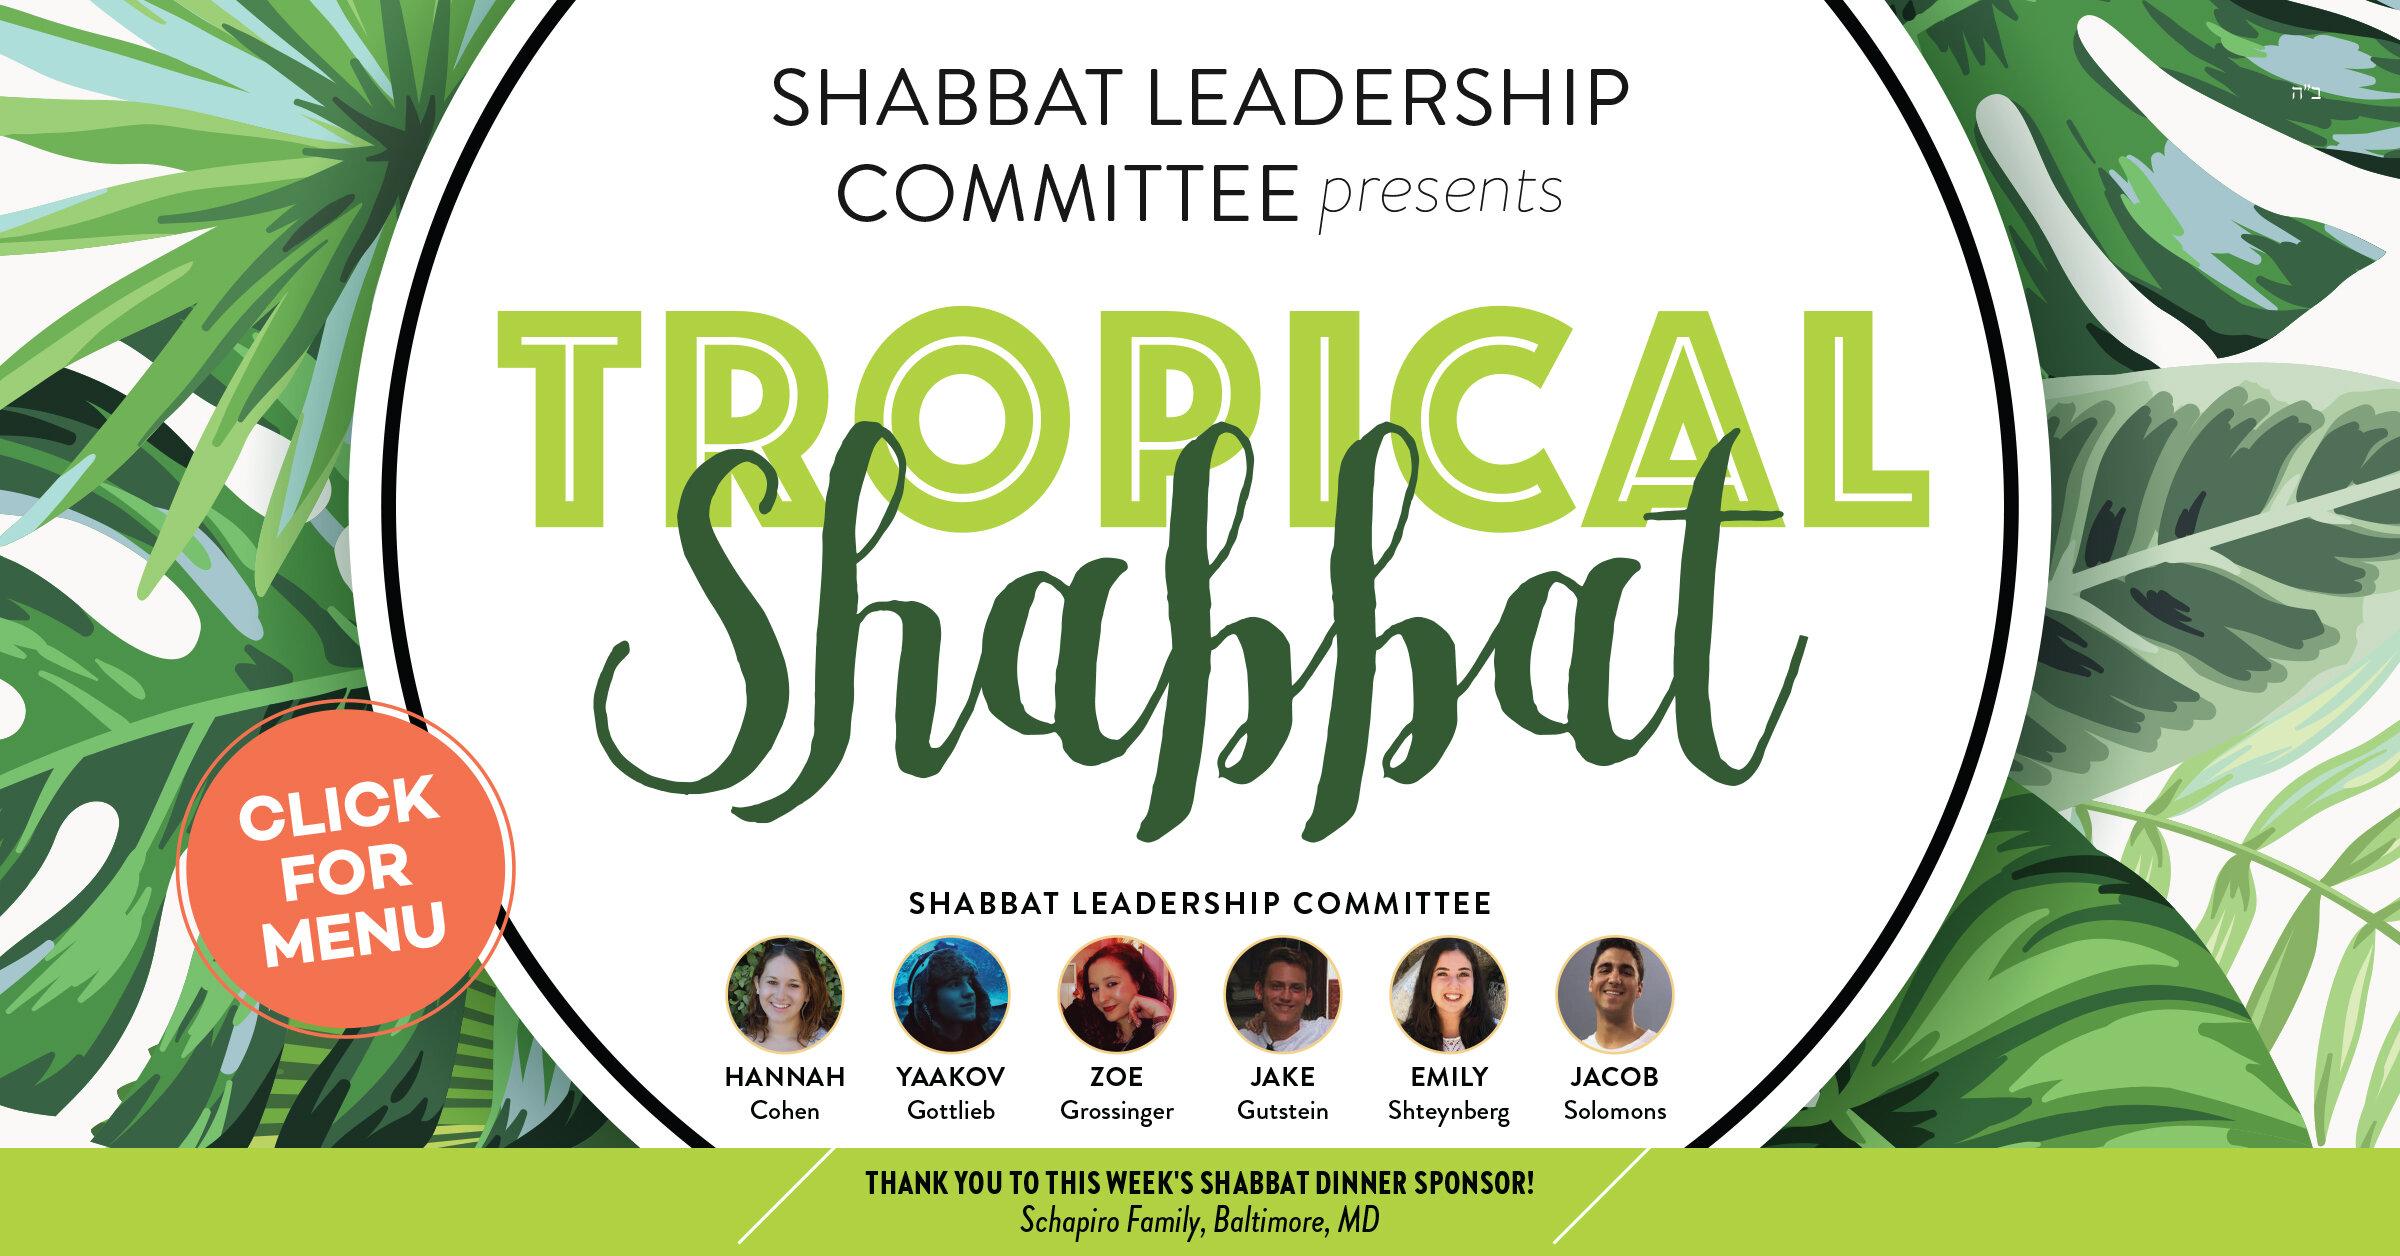 Tropical-Shabbat---Image-for-FB.jpg